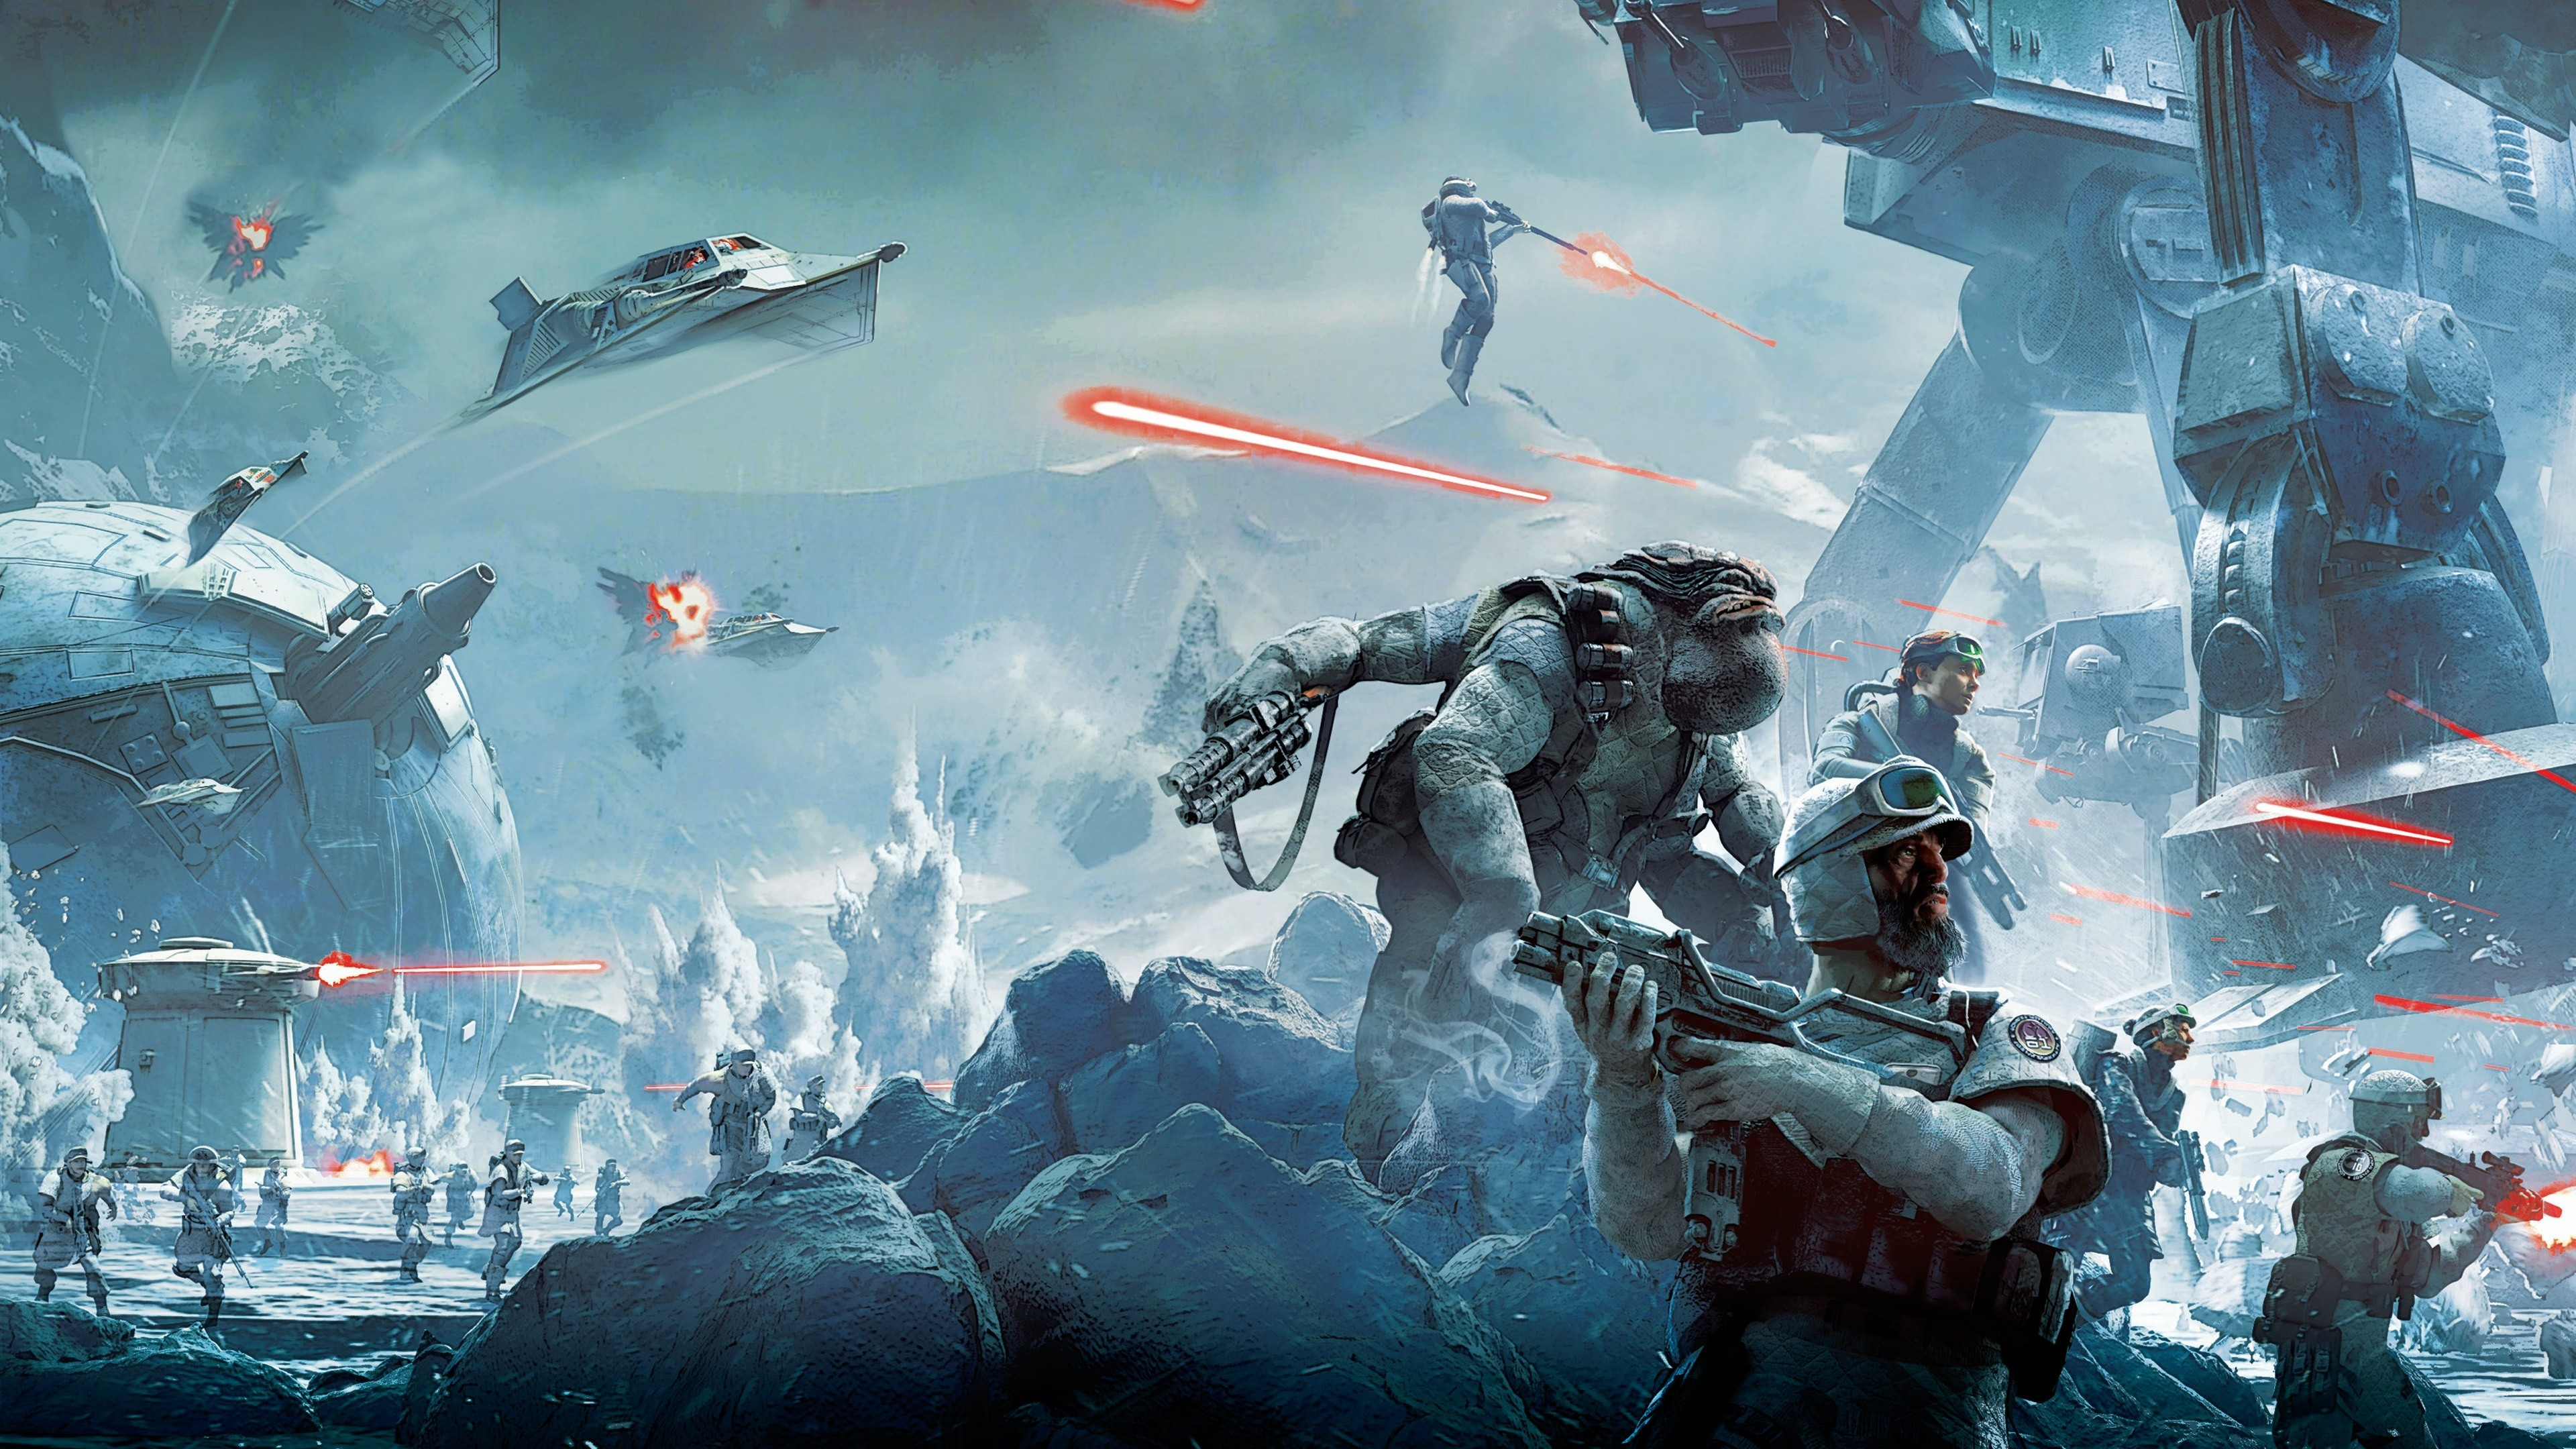 My Second Star Wars Wallpaper Dump Epic Star Wars